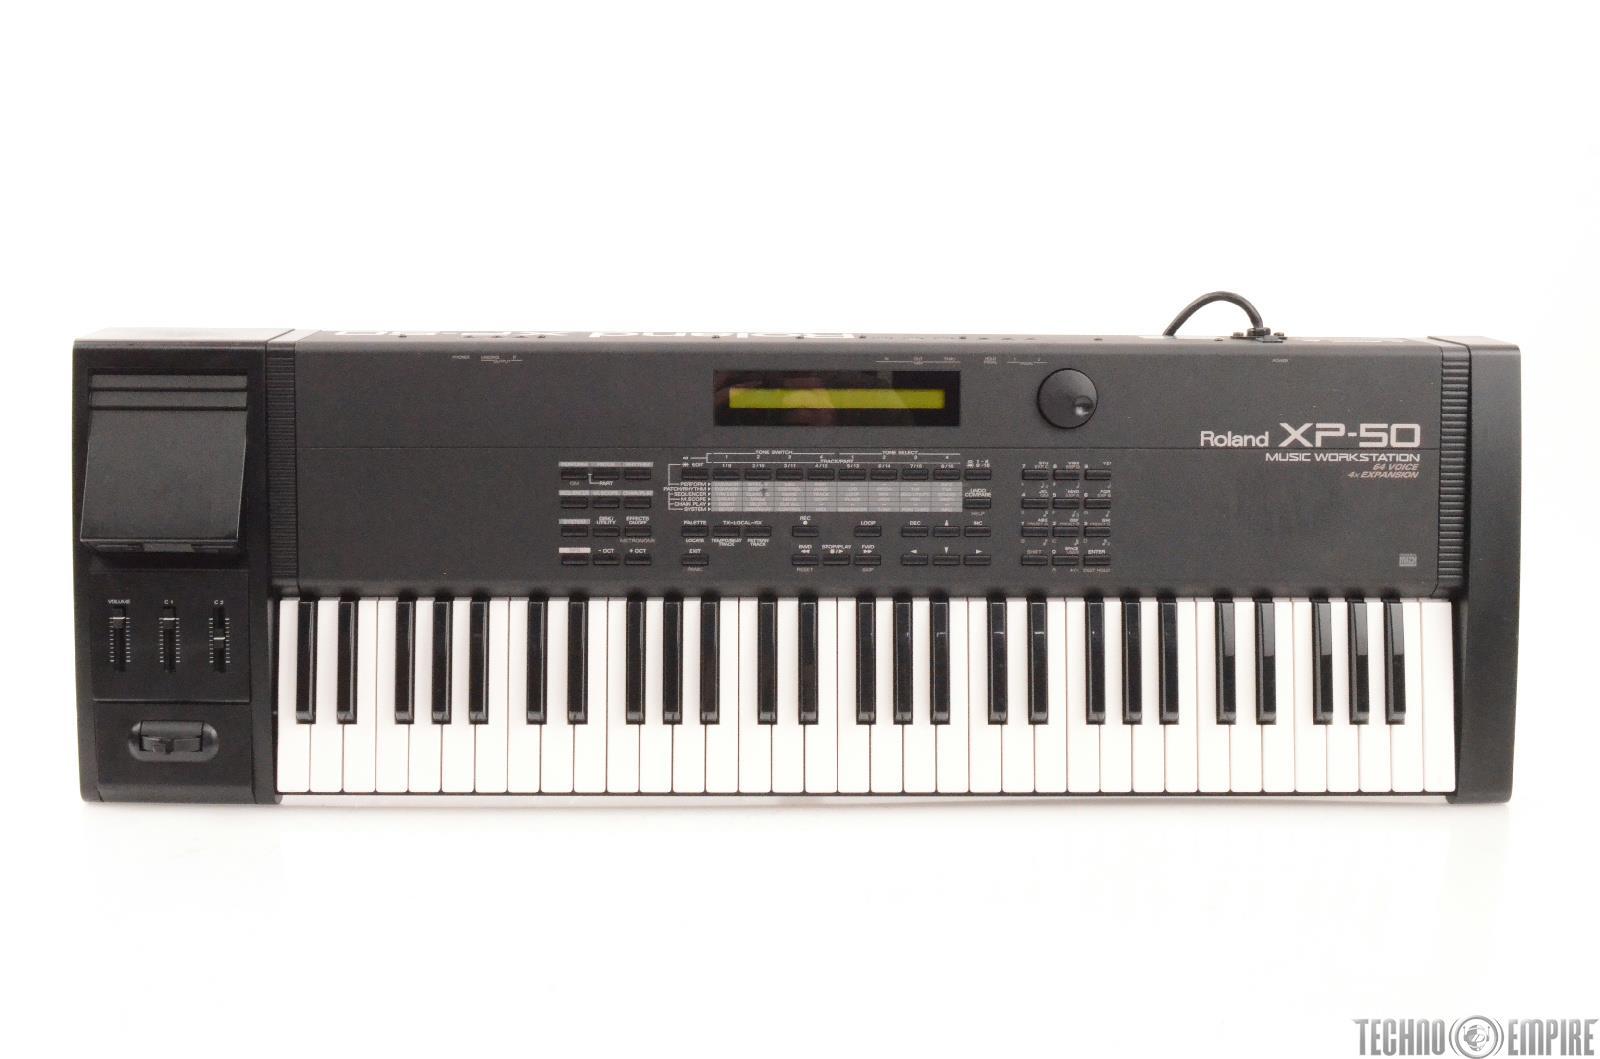 Roland XP-50 Music Workstation 61-Key Keyboard 64 Voice #27148